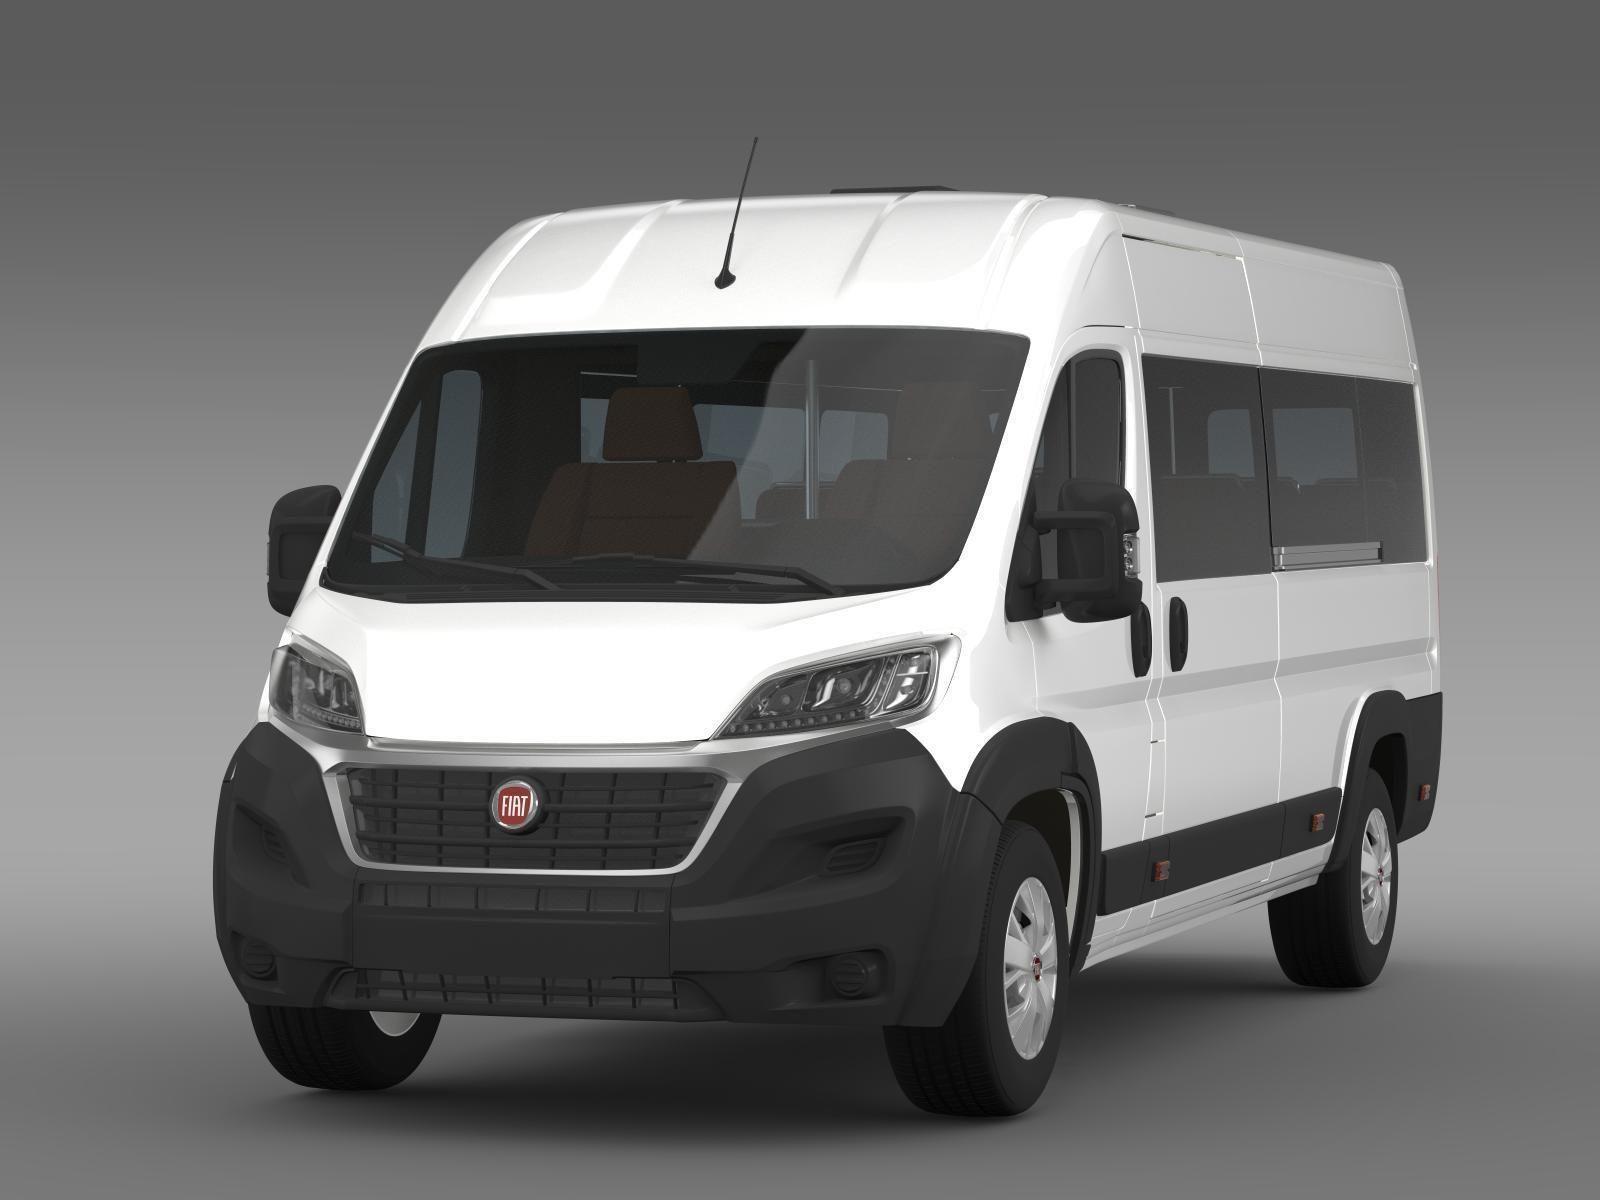 fiat ducato scuolabus 2015 3d model max obj 3ds fbx. Black Bedroom Furniture Sets. Home Design Ideas